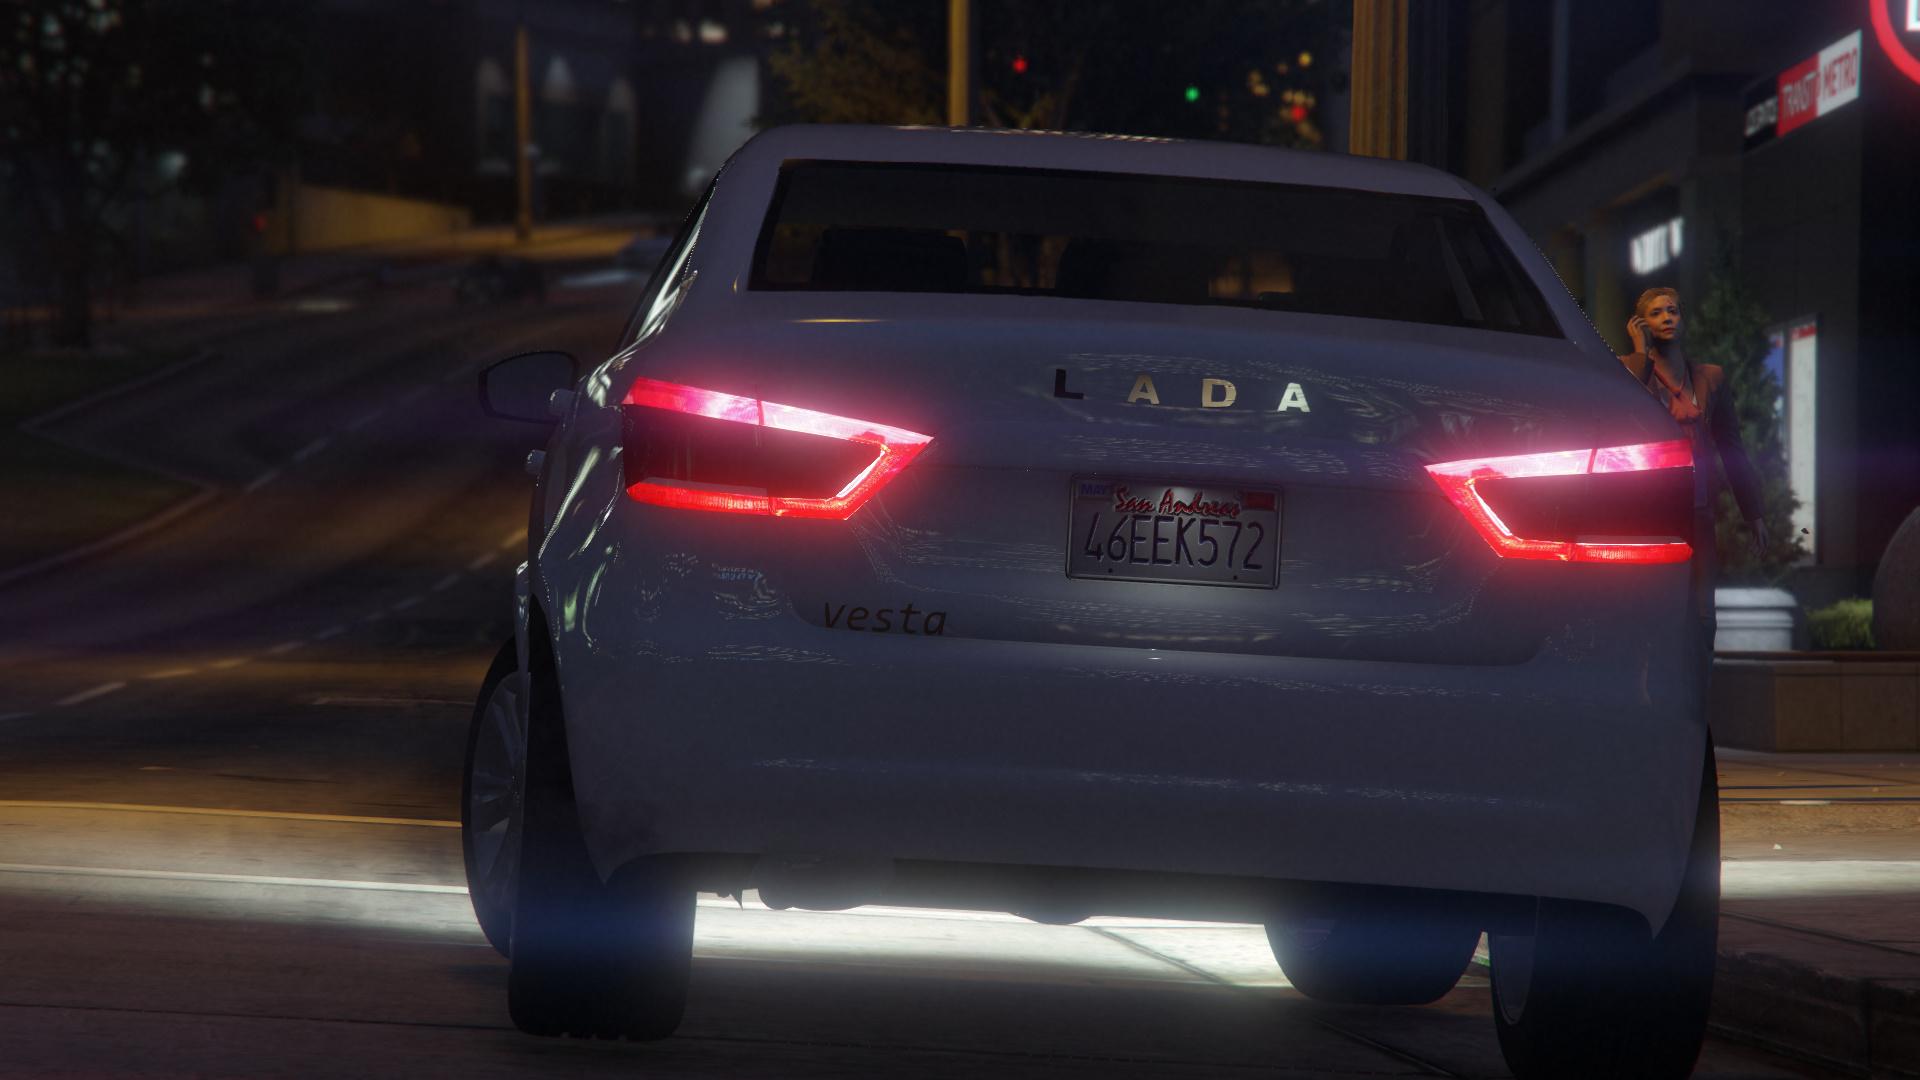 2015 Lada Vesta для GTA V - Скриншот 3